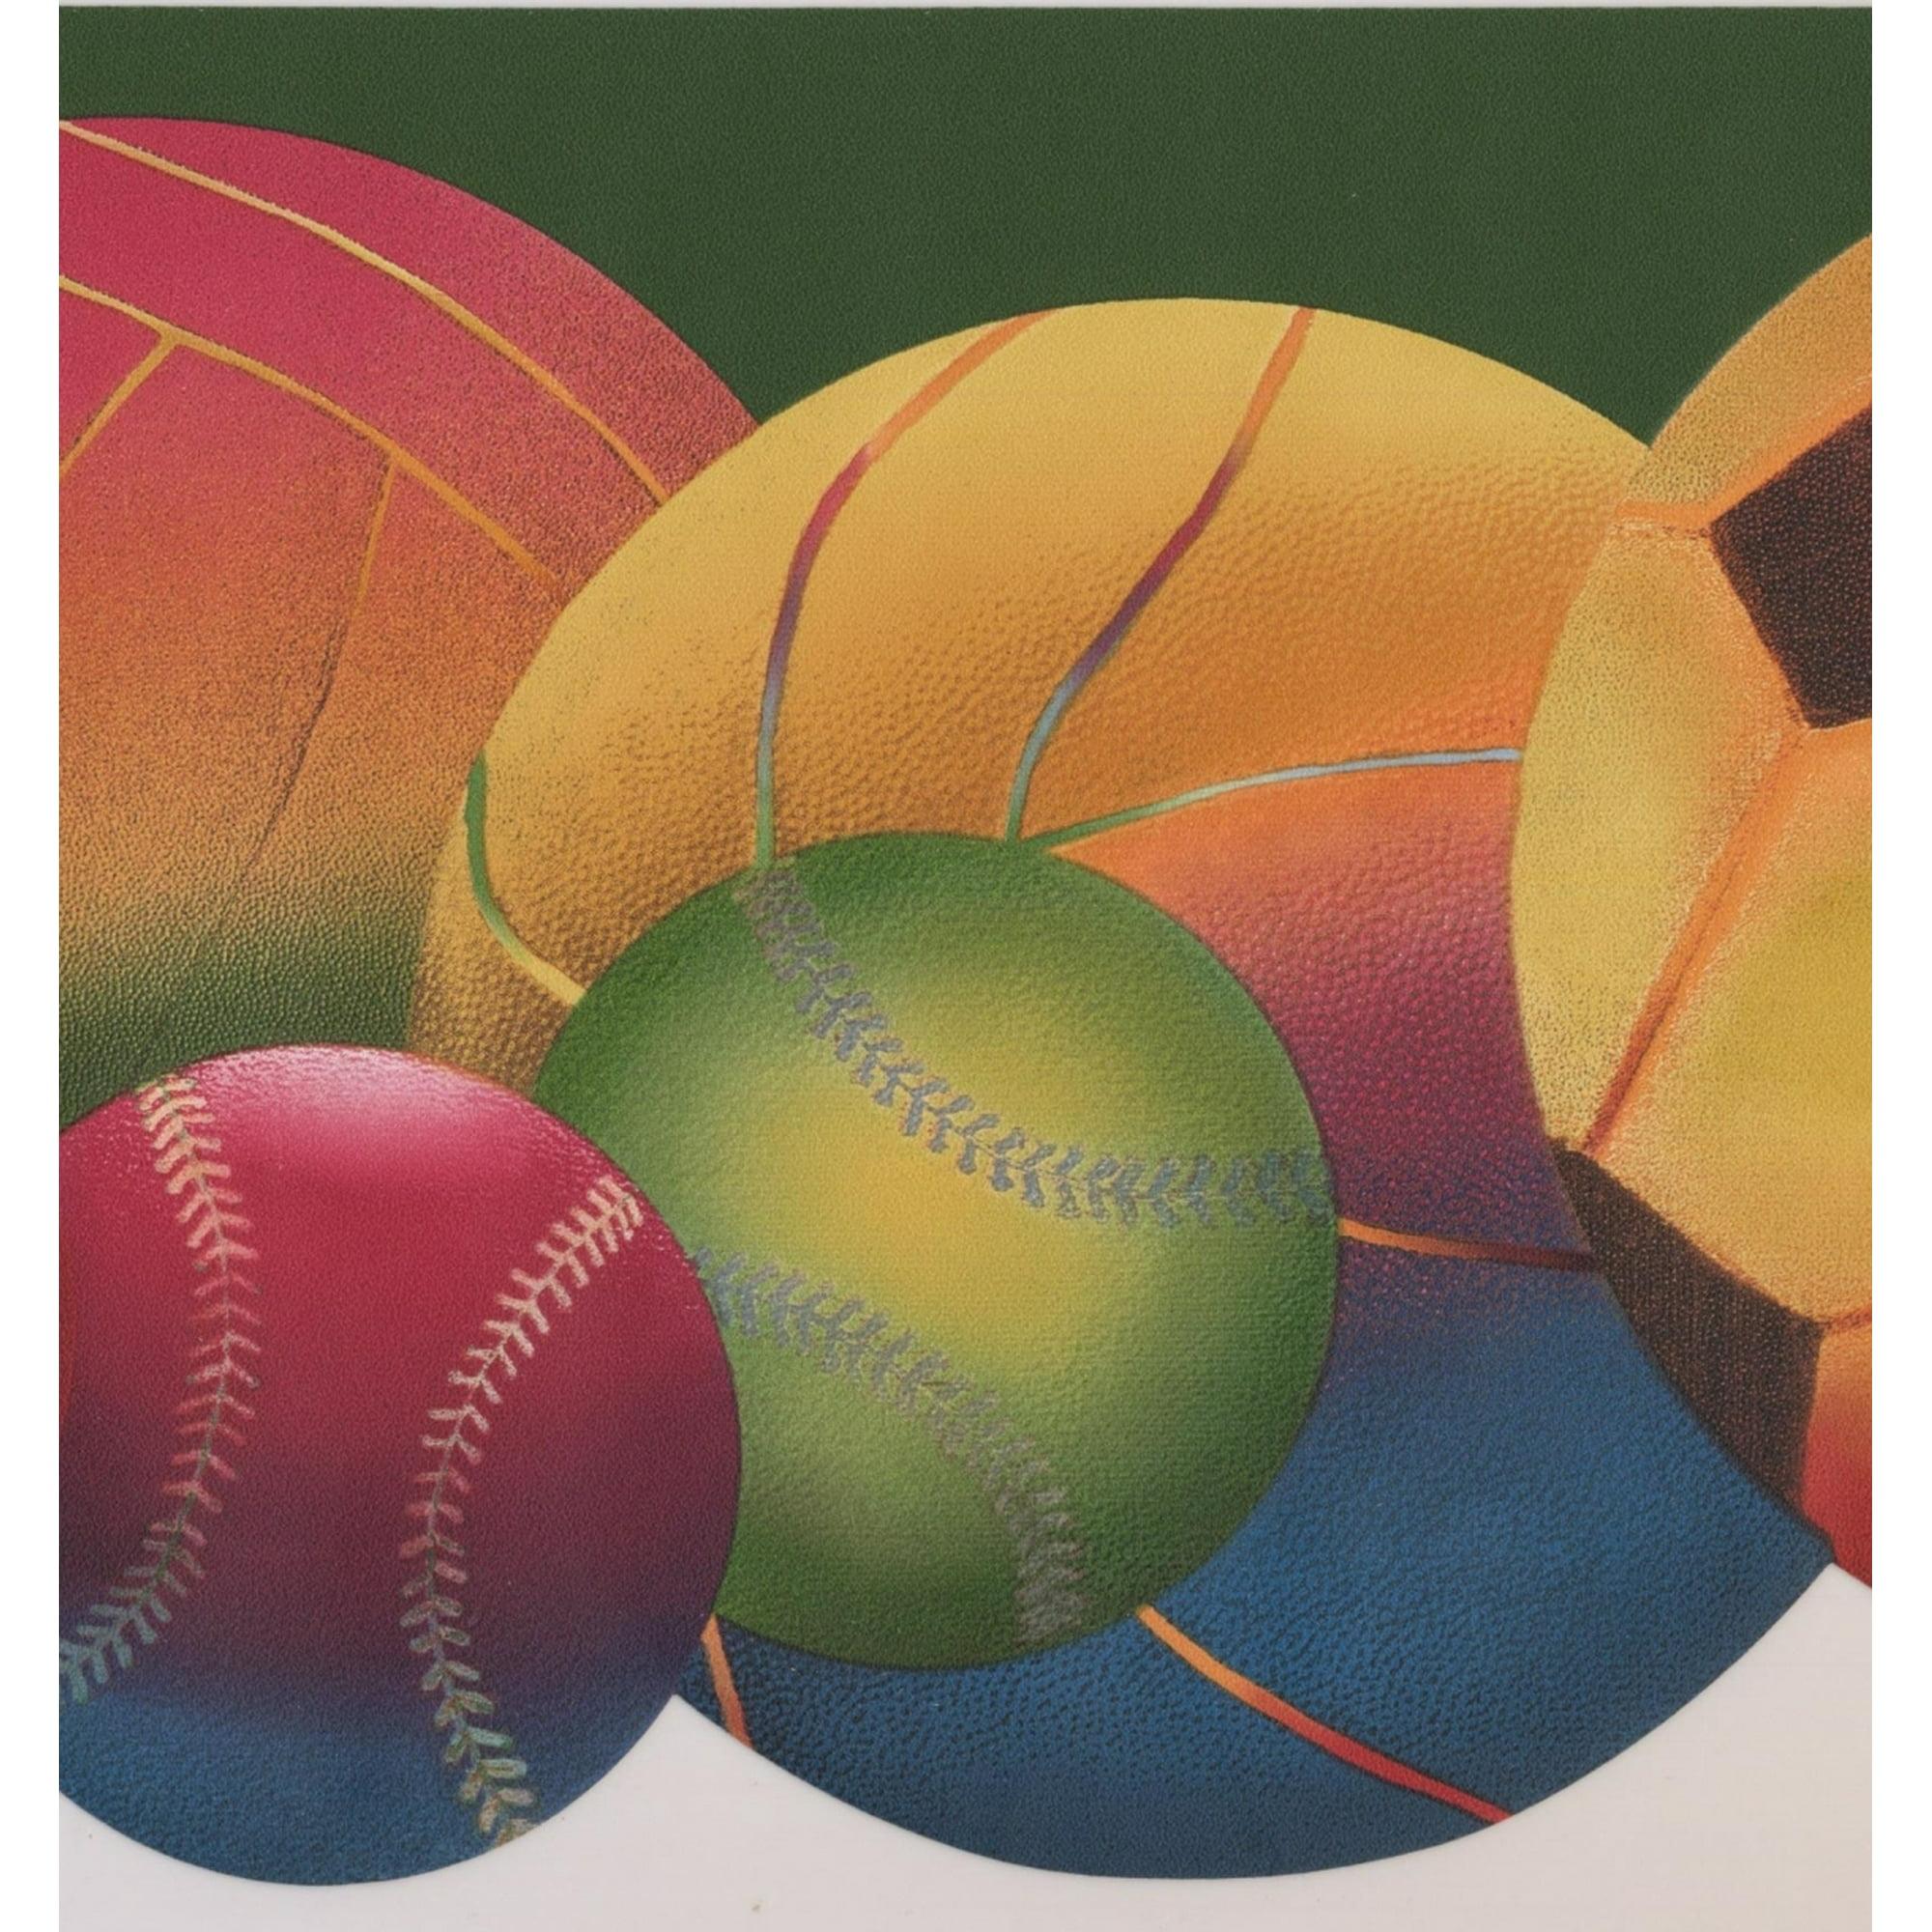 Colorful Football Baseball Soccer Ball Green Modern Wallpaper Border Sport Design Roll 15 X 8 5 Walmart Canada